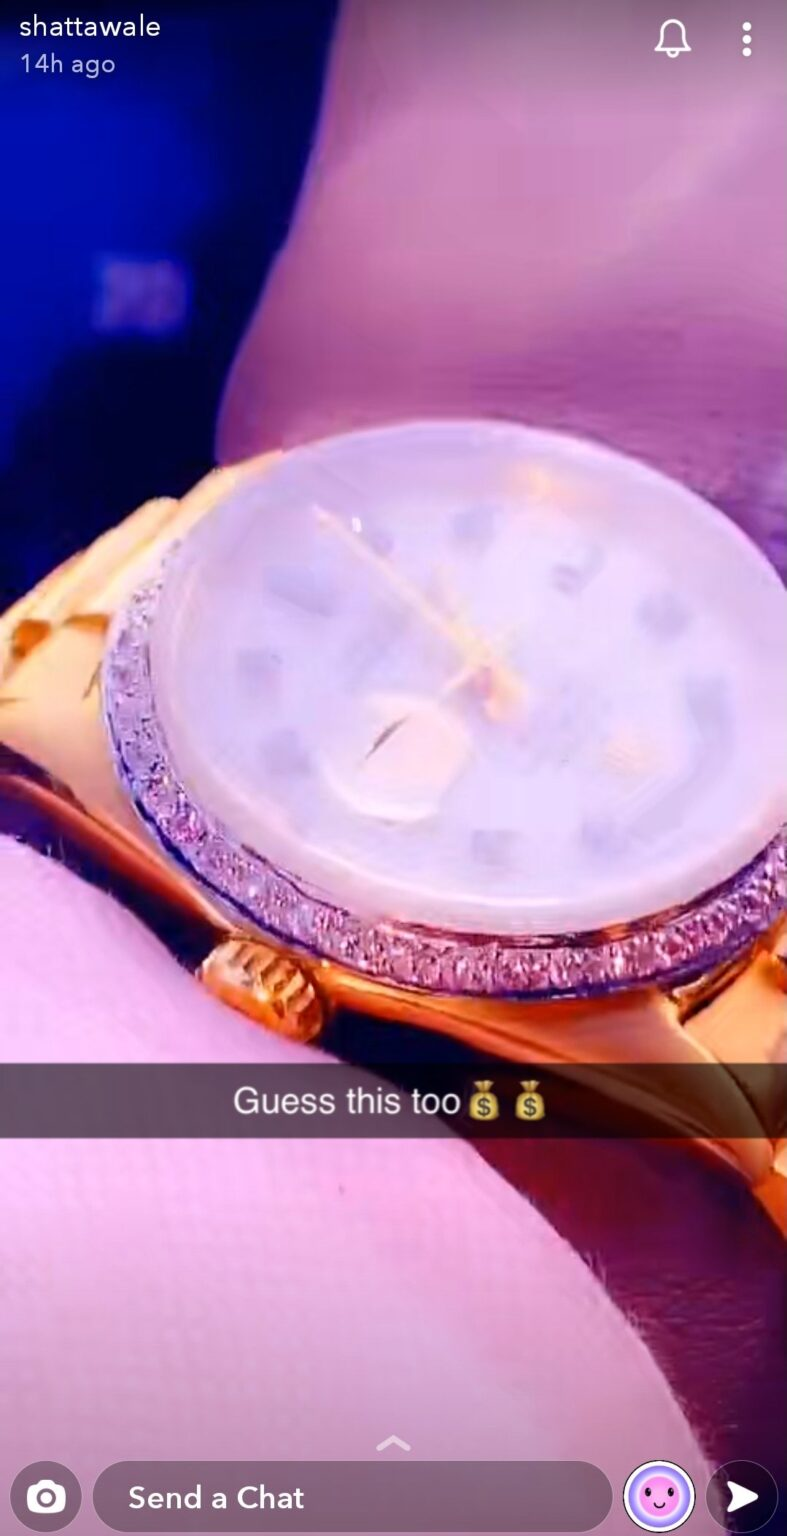 Shatta Wale Rolex watch